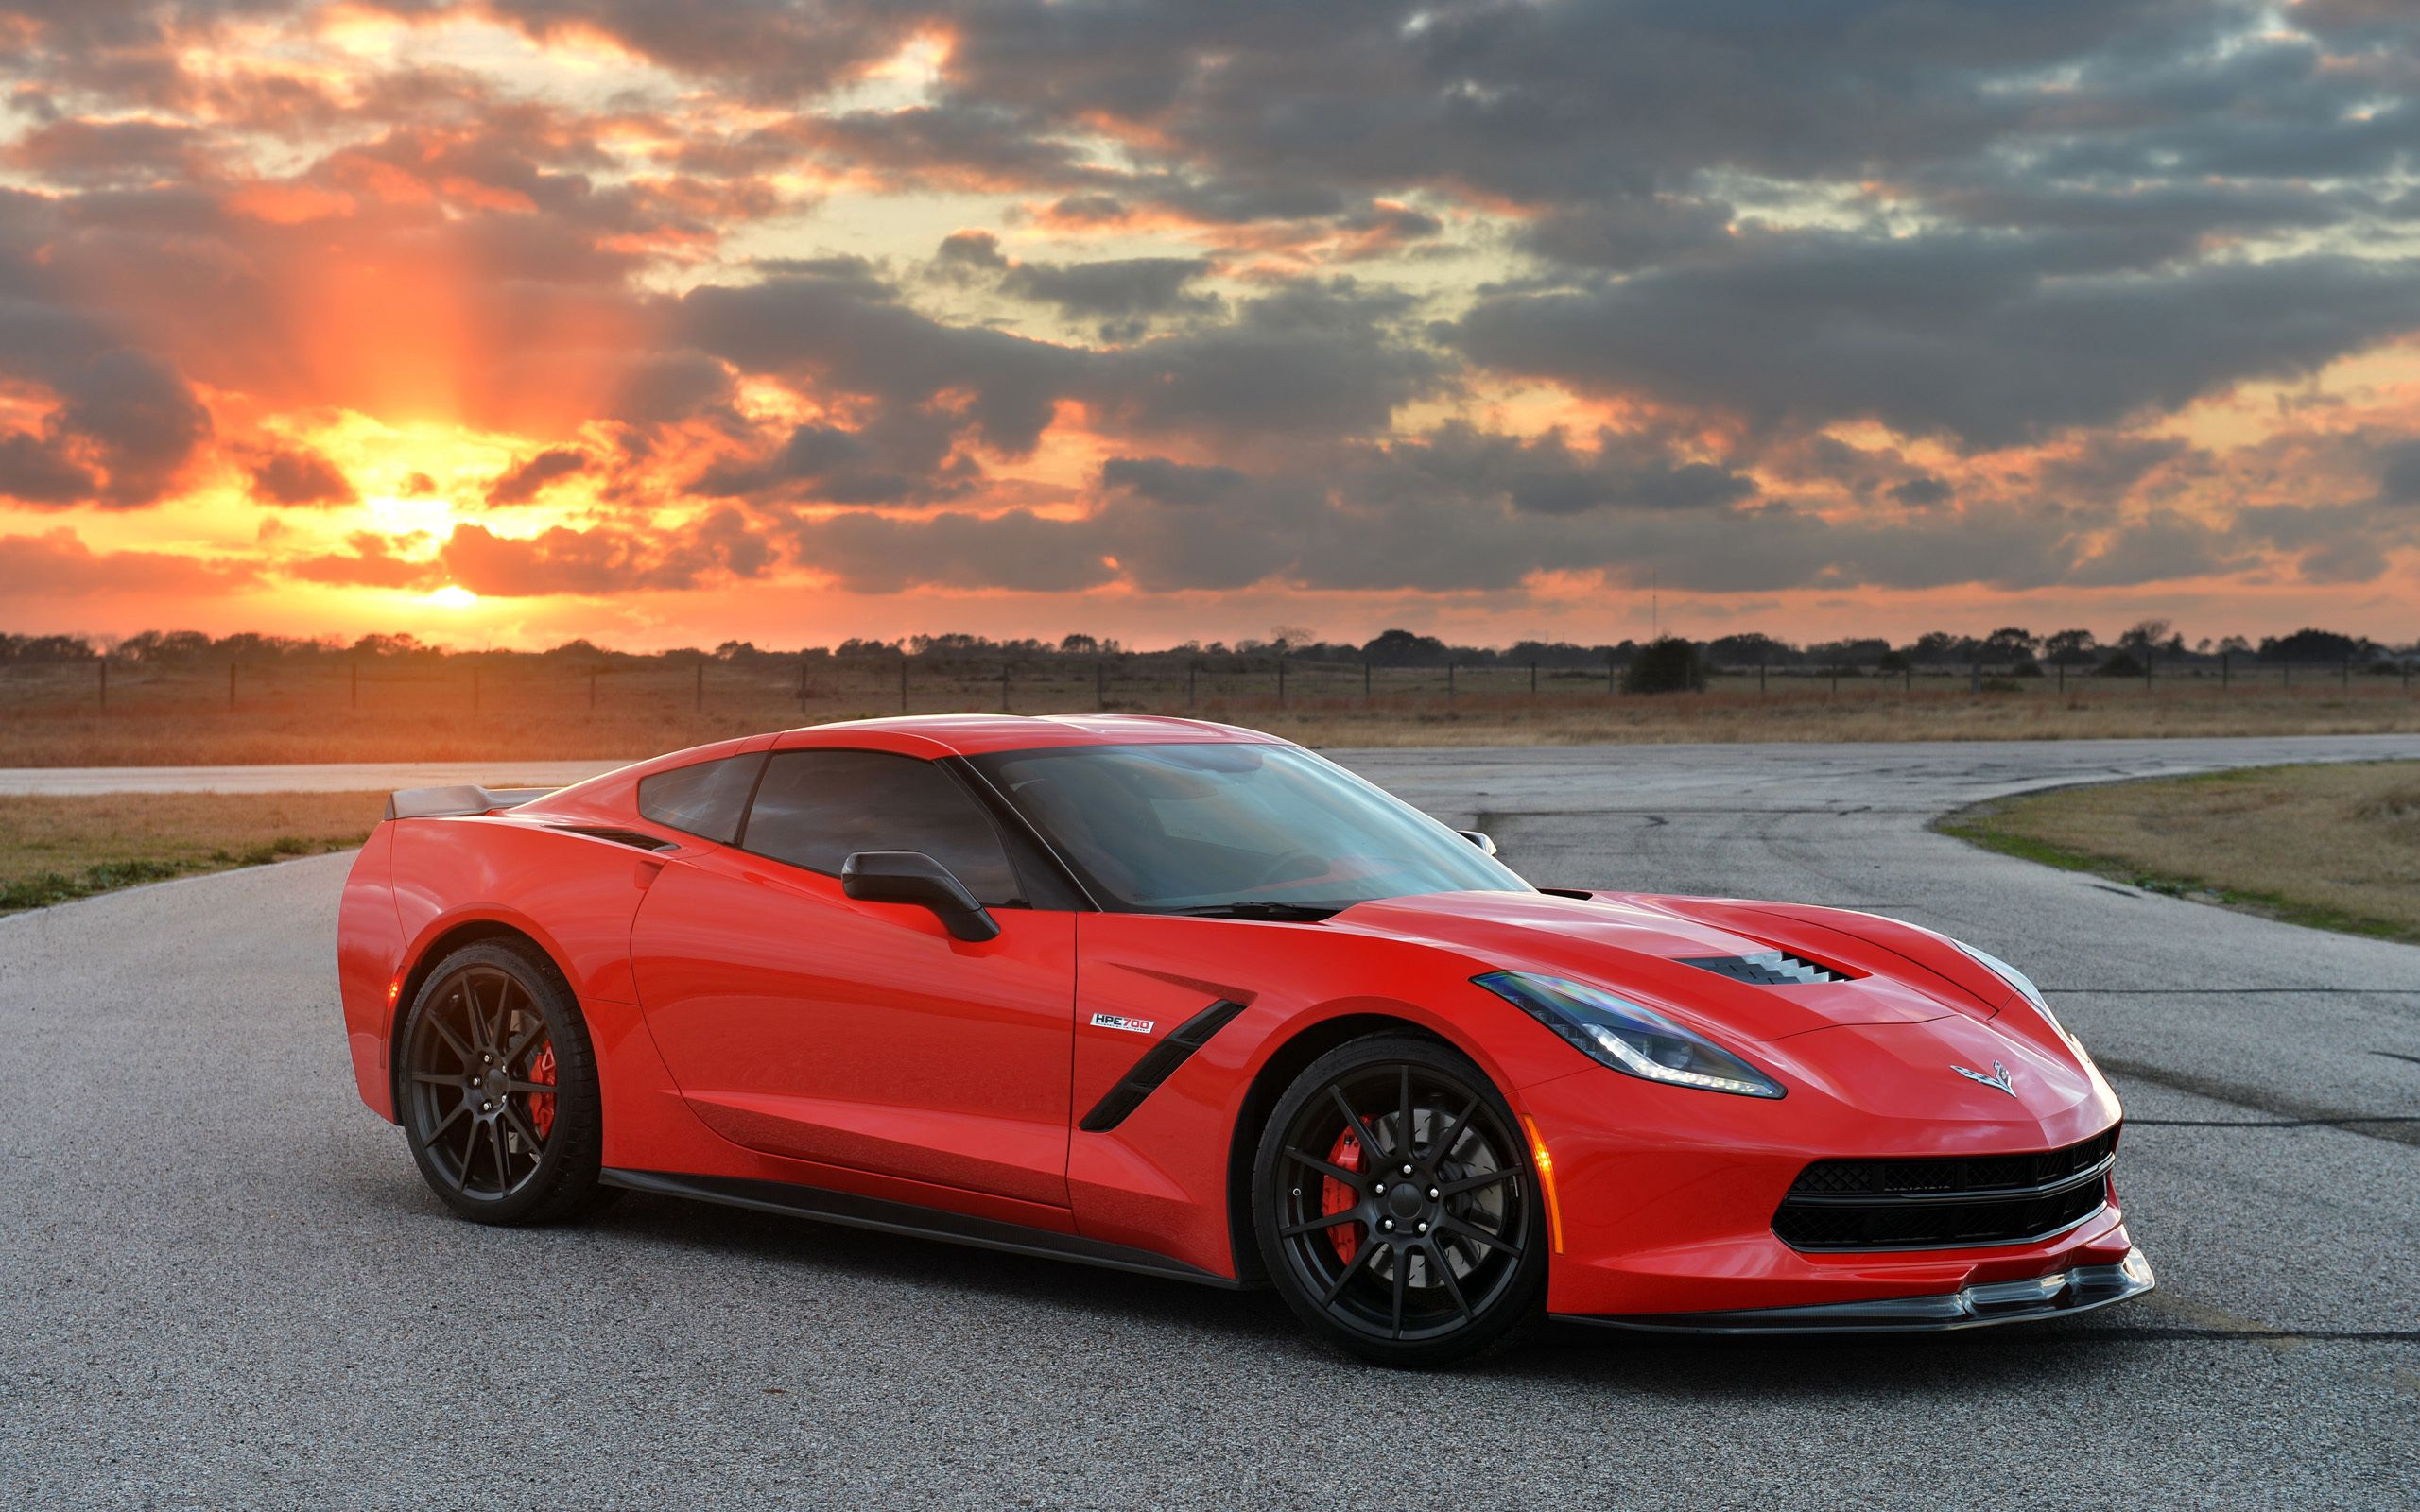 69722 скачать обои Тачки (Cars), Шевроле (Chevrolet), Corvette, Stingray, Twin Turbo, C7, 2014 - заставки и картинки бесплатно